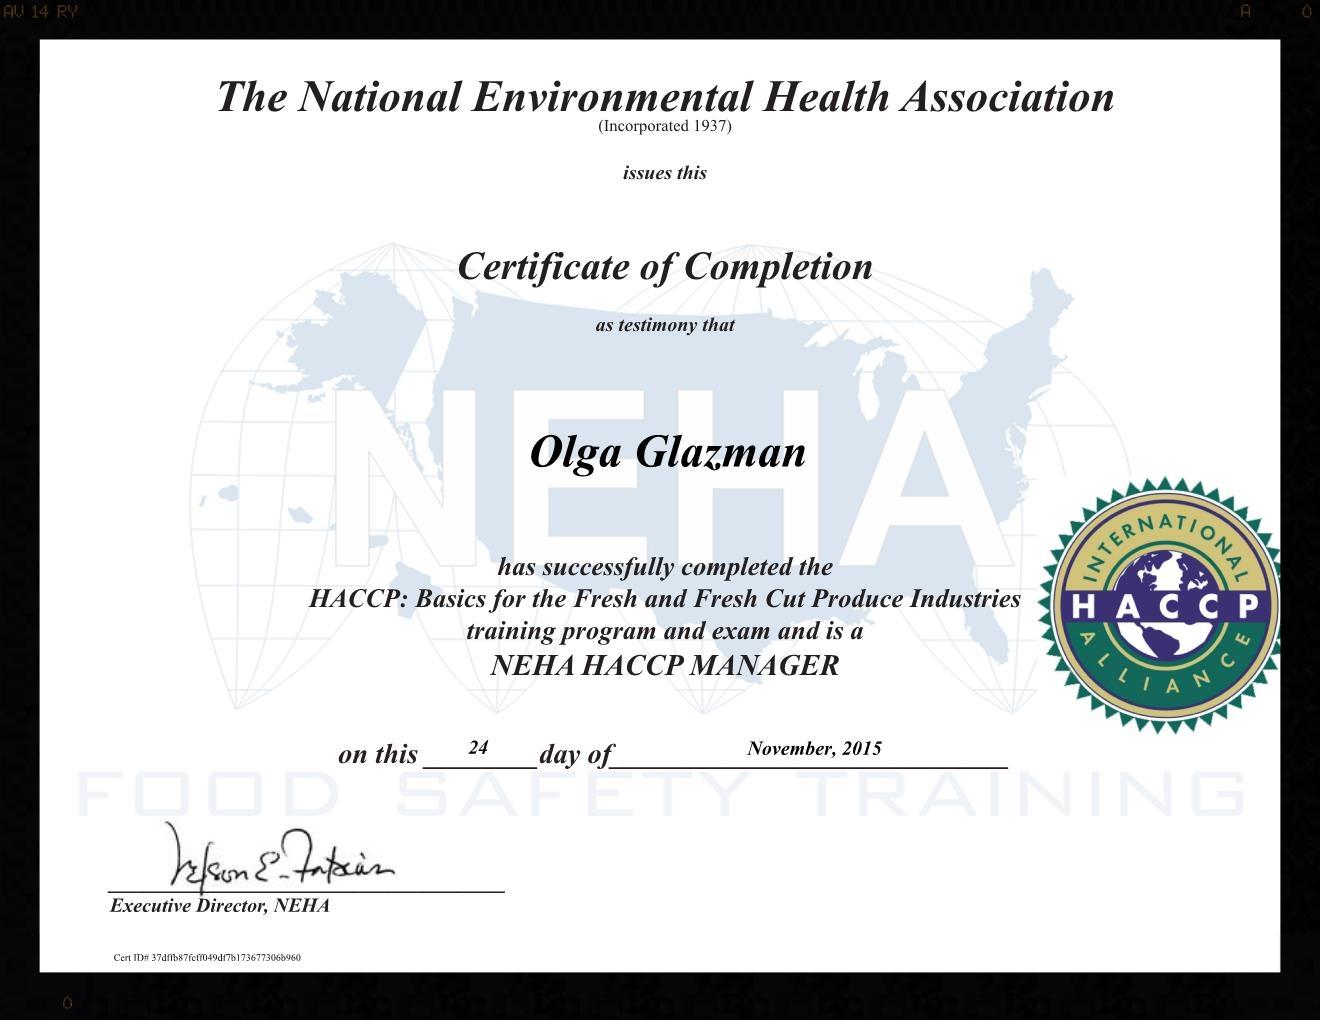 Olga Glazman HACCP certification